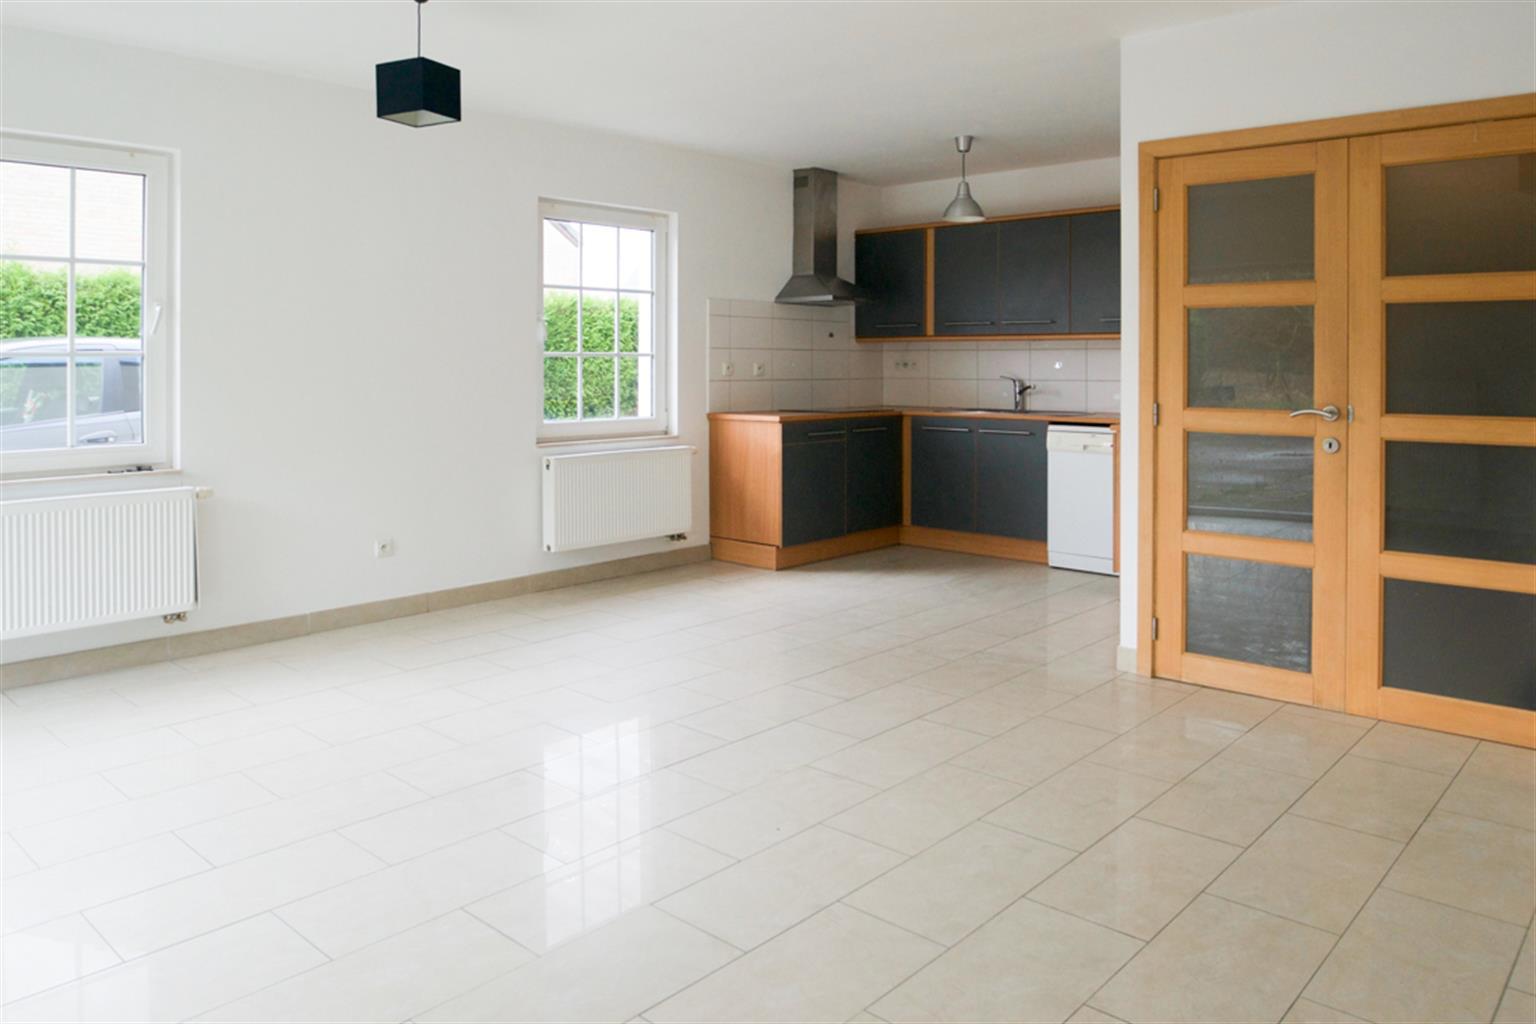 Appartement - Binche Leval-Trahegnies - #3734770-1